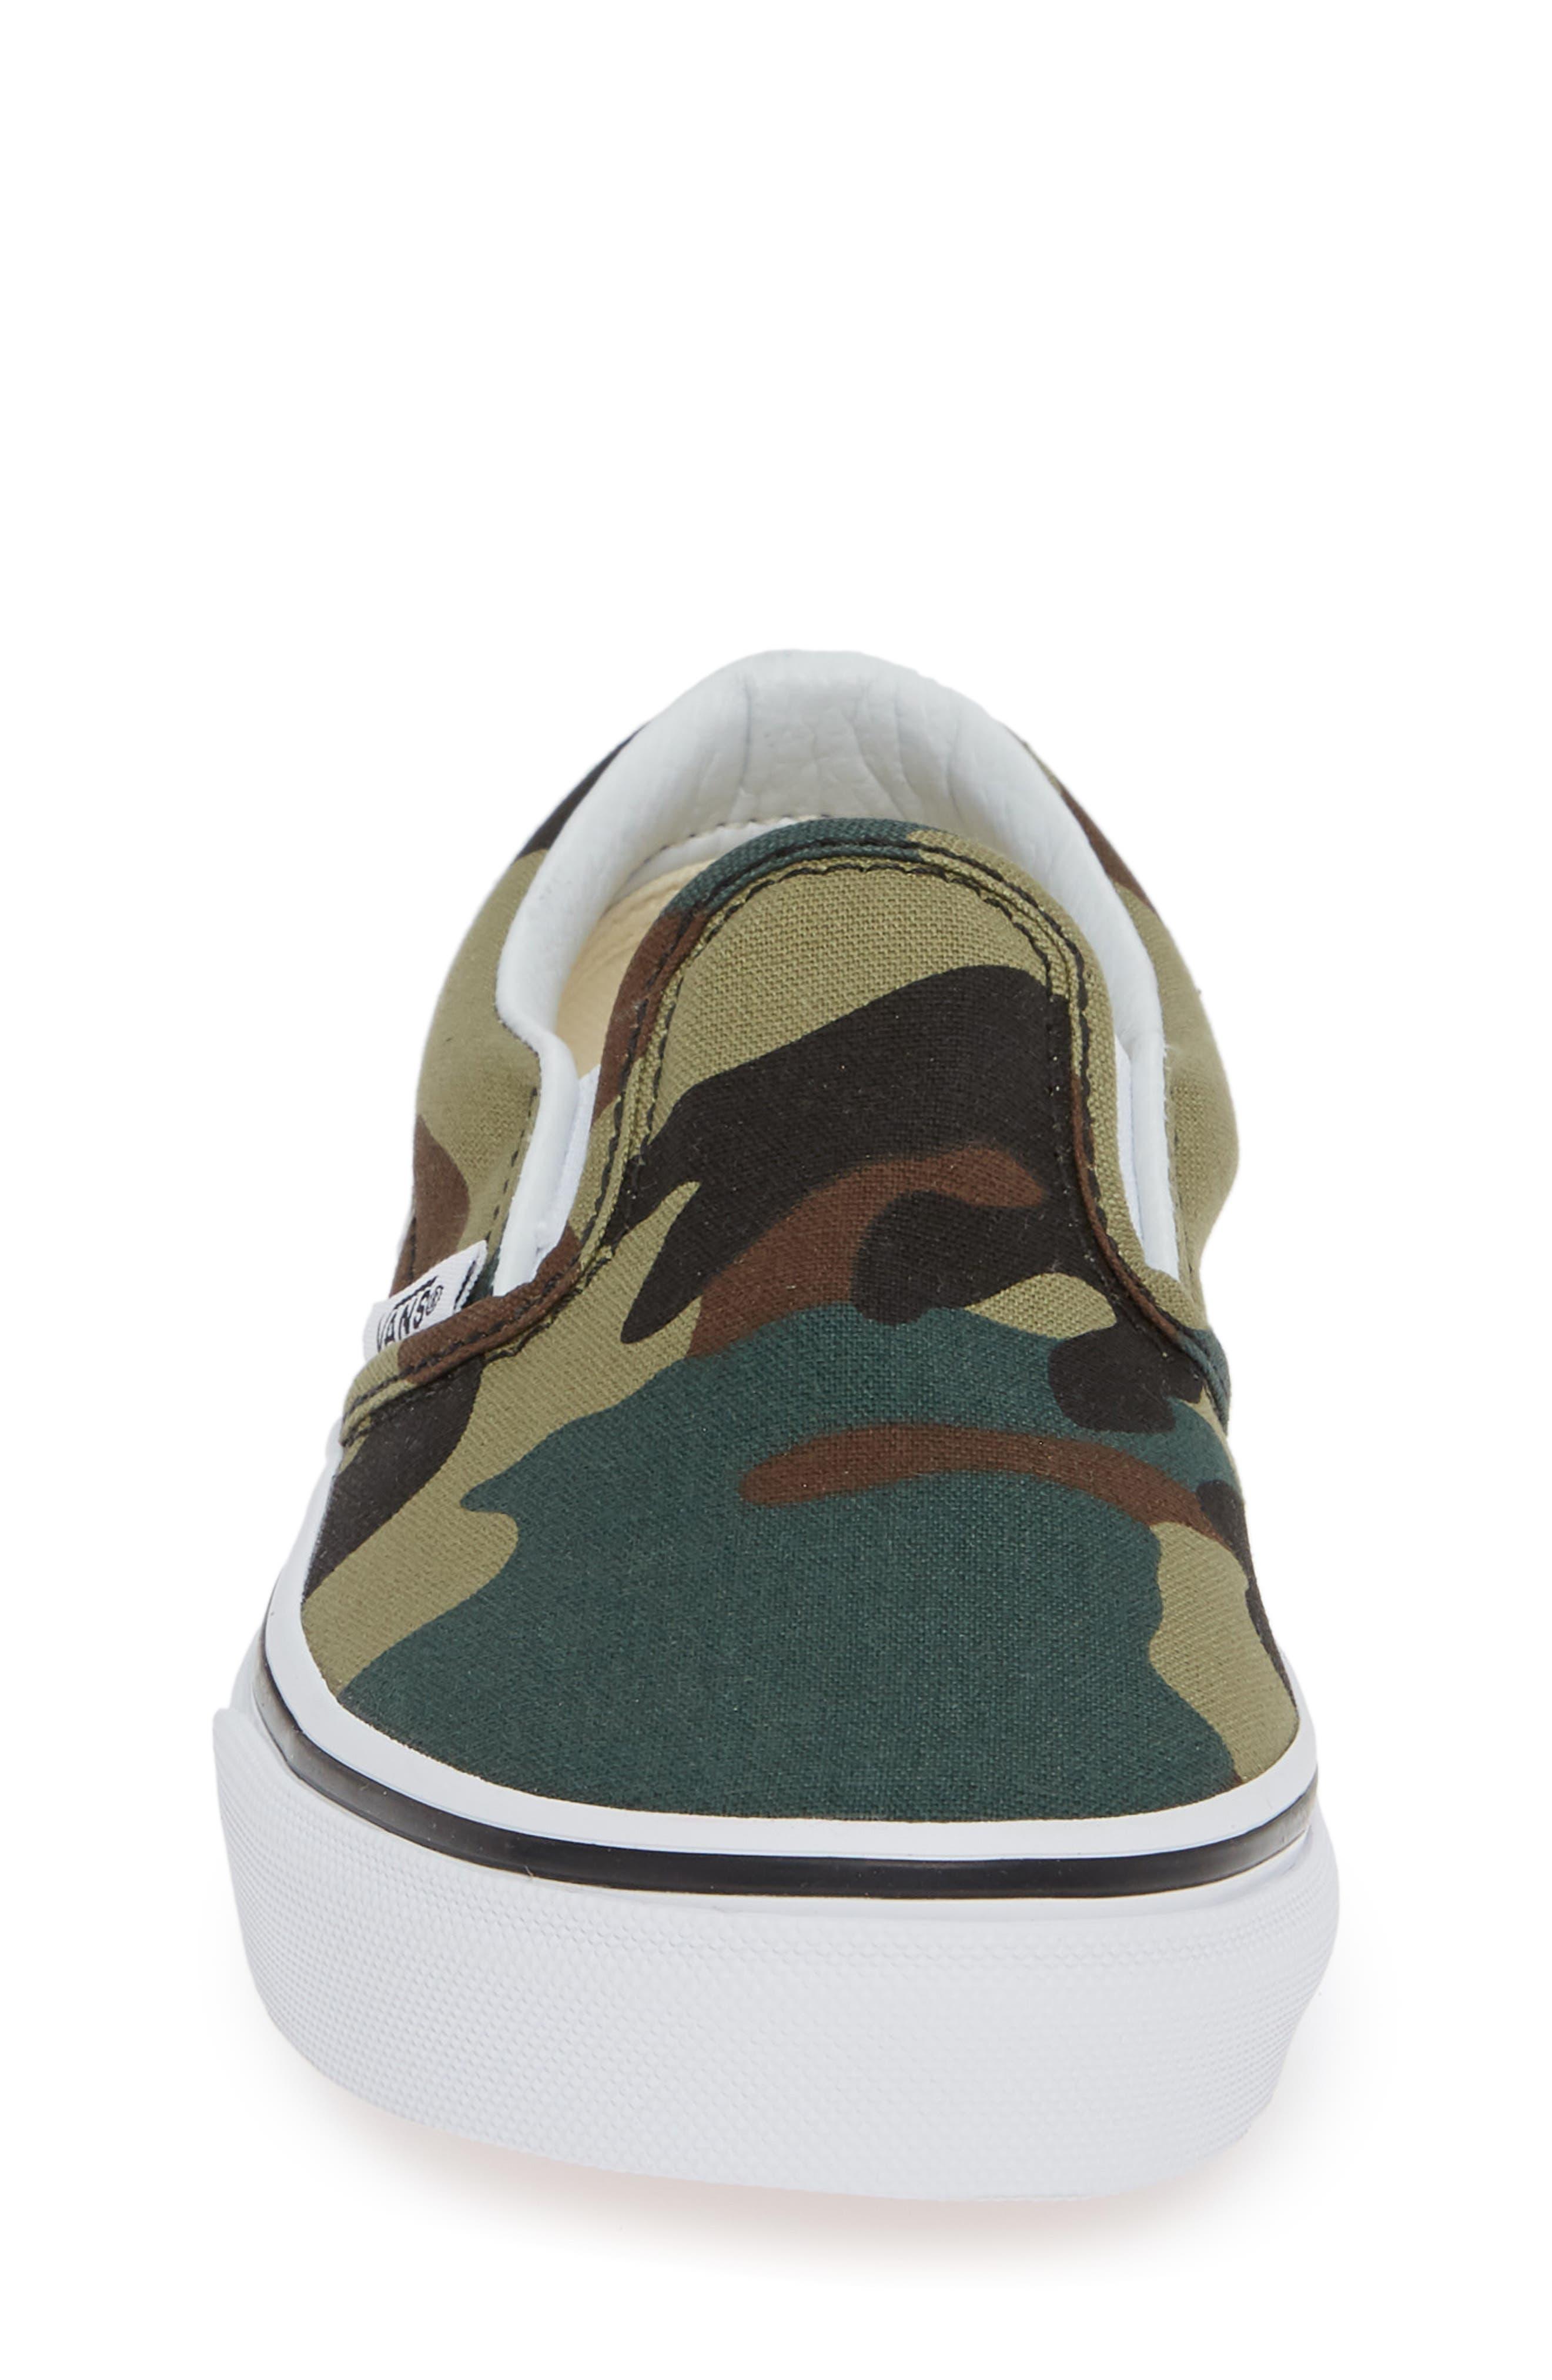 Classic Slip-On Sneaker,                             Alternate thumbnail 4, color,                             WOODLAND CAMO BLACK/ WOODLAND